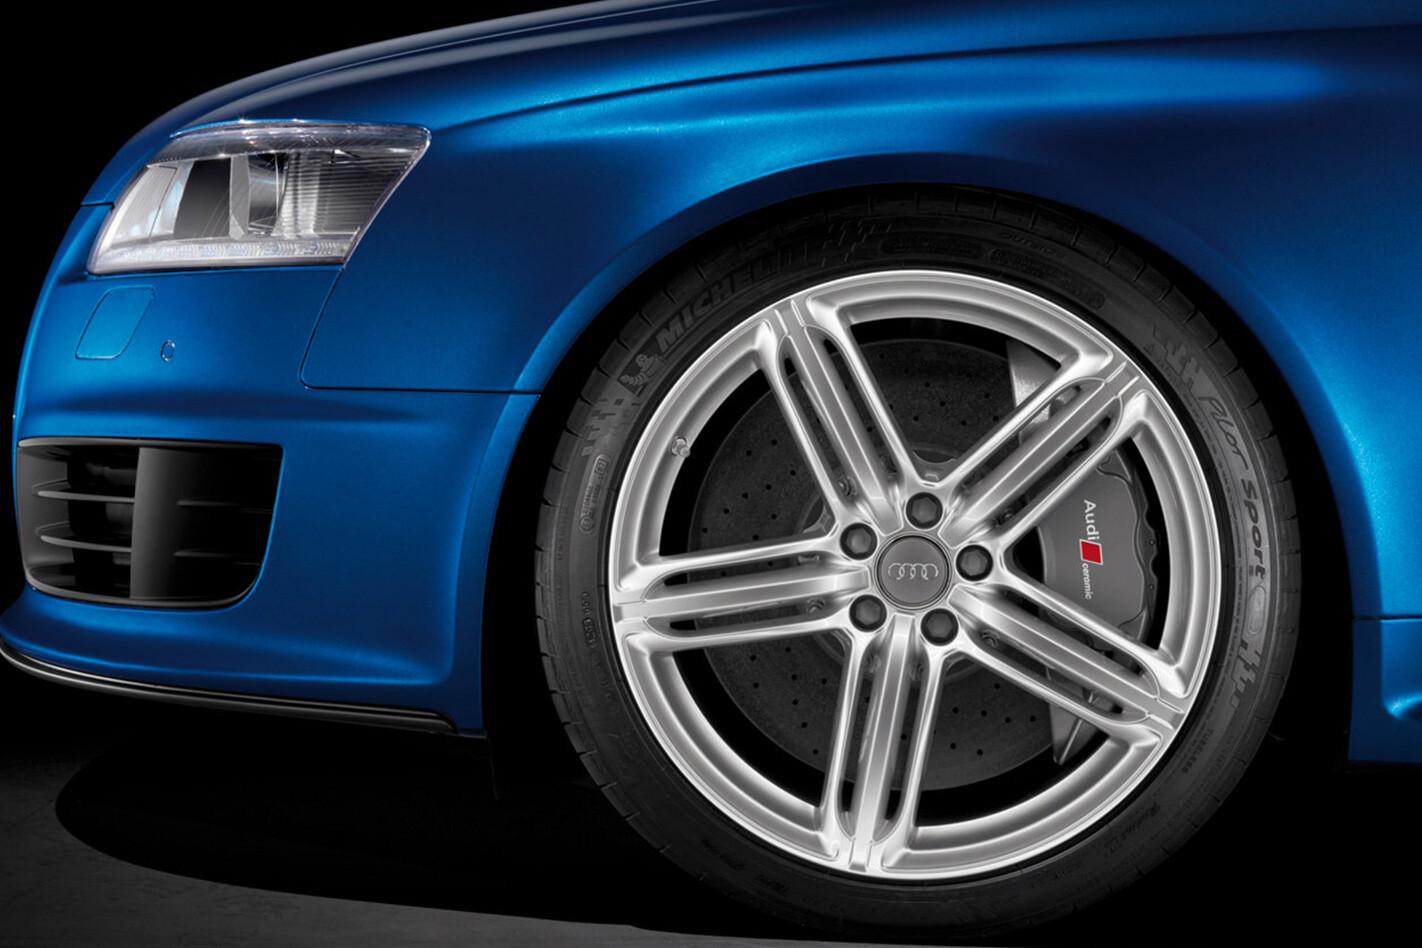 2008 Audi RS6 Avant wheel